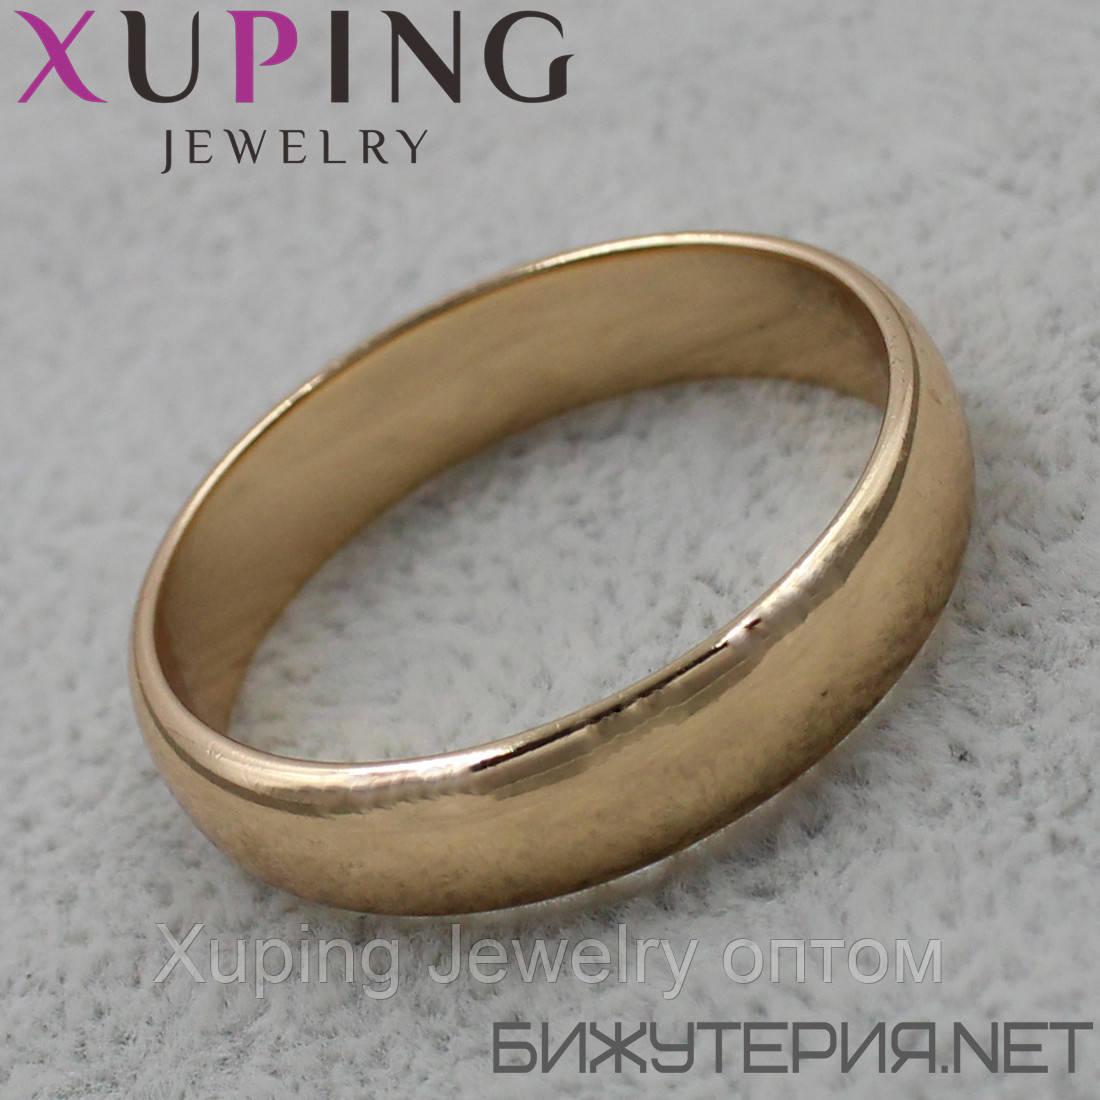 Кольцо Xuping медицинское золото 18K Gold - 1027226716